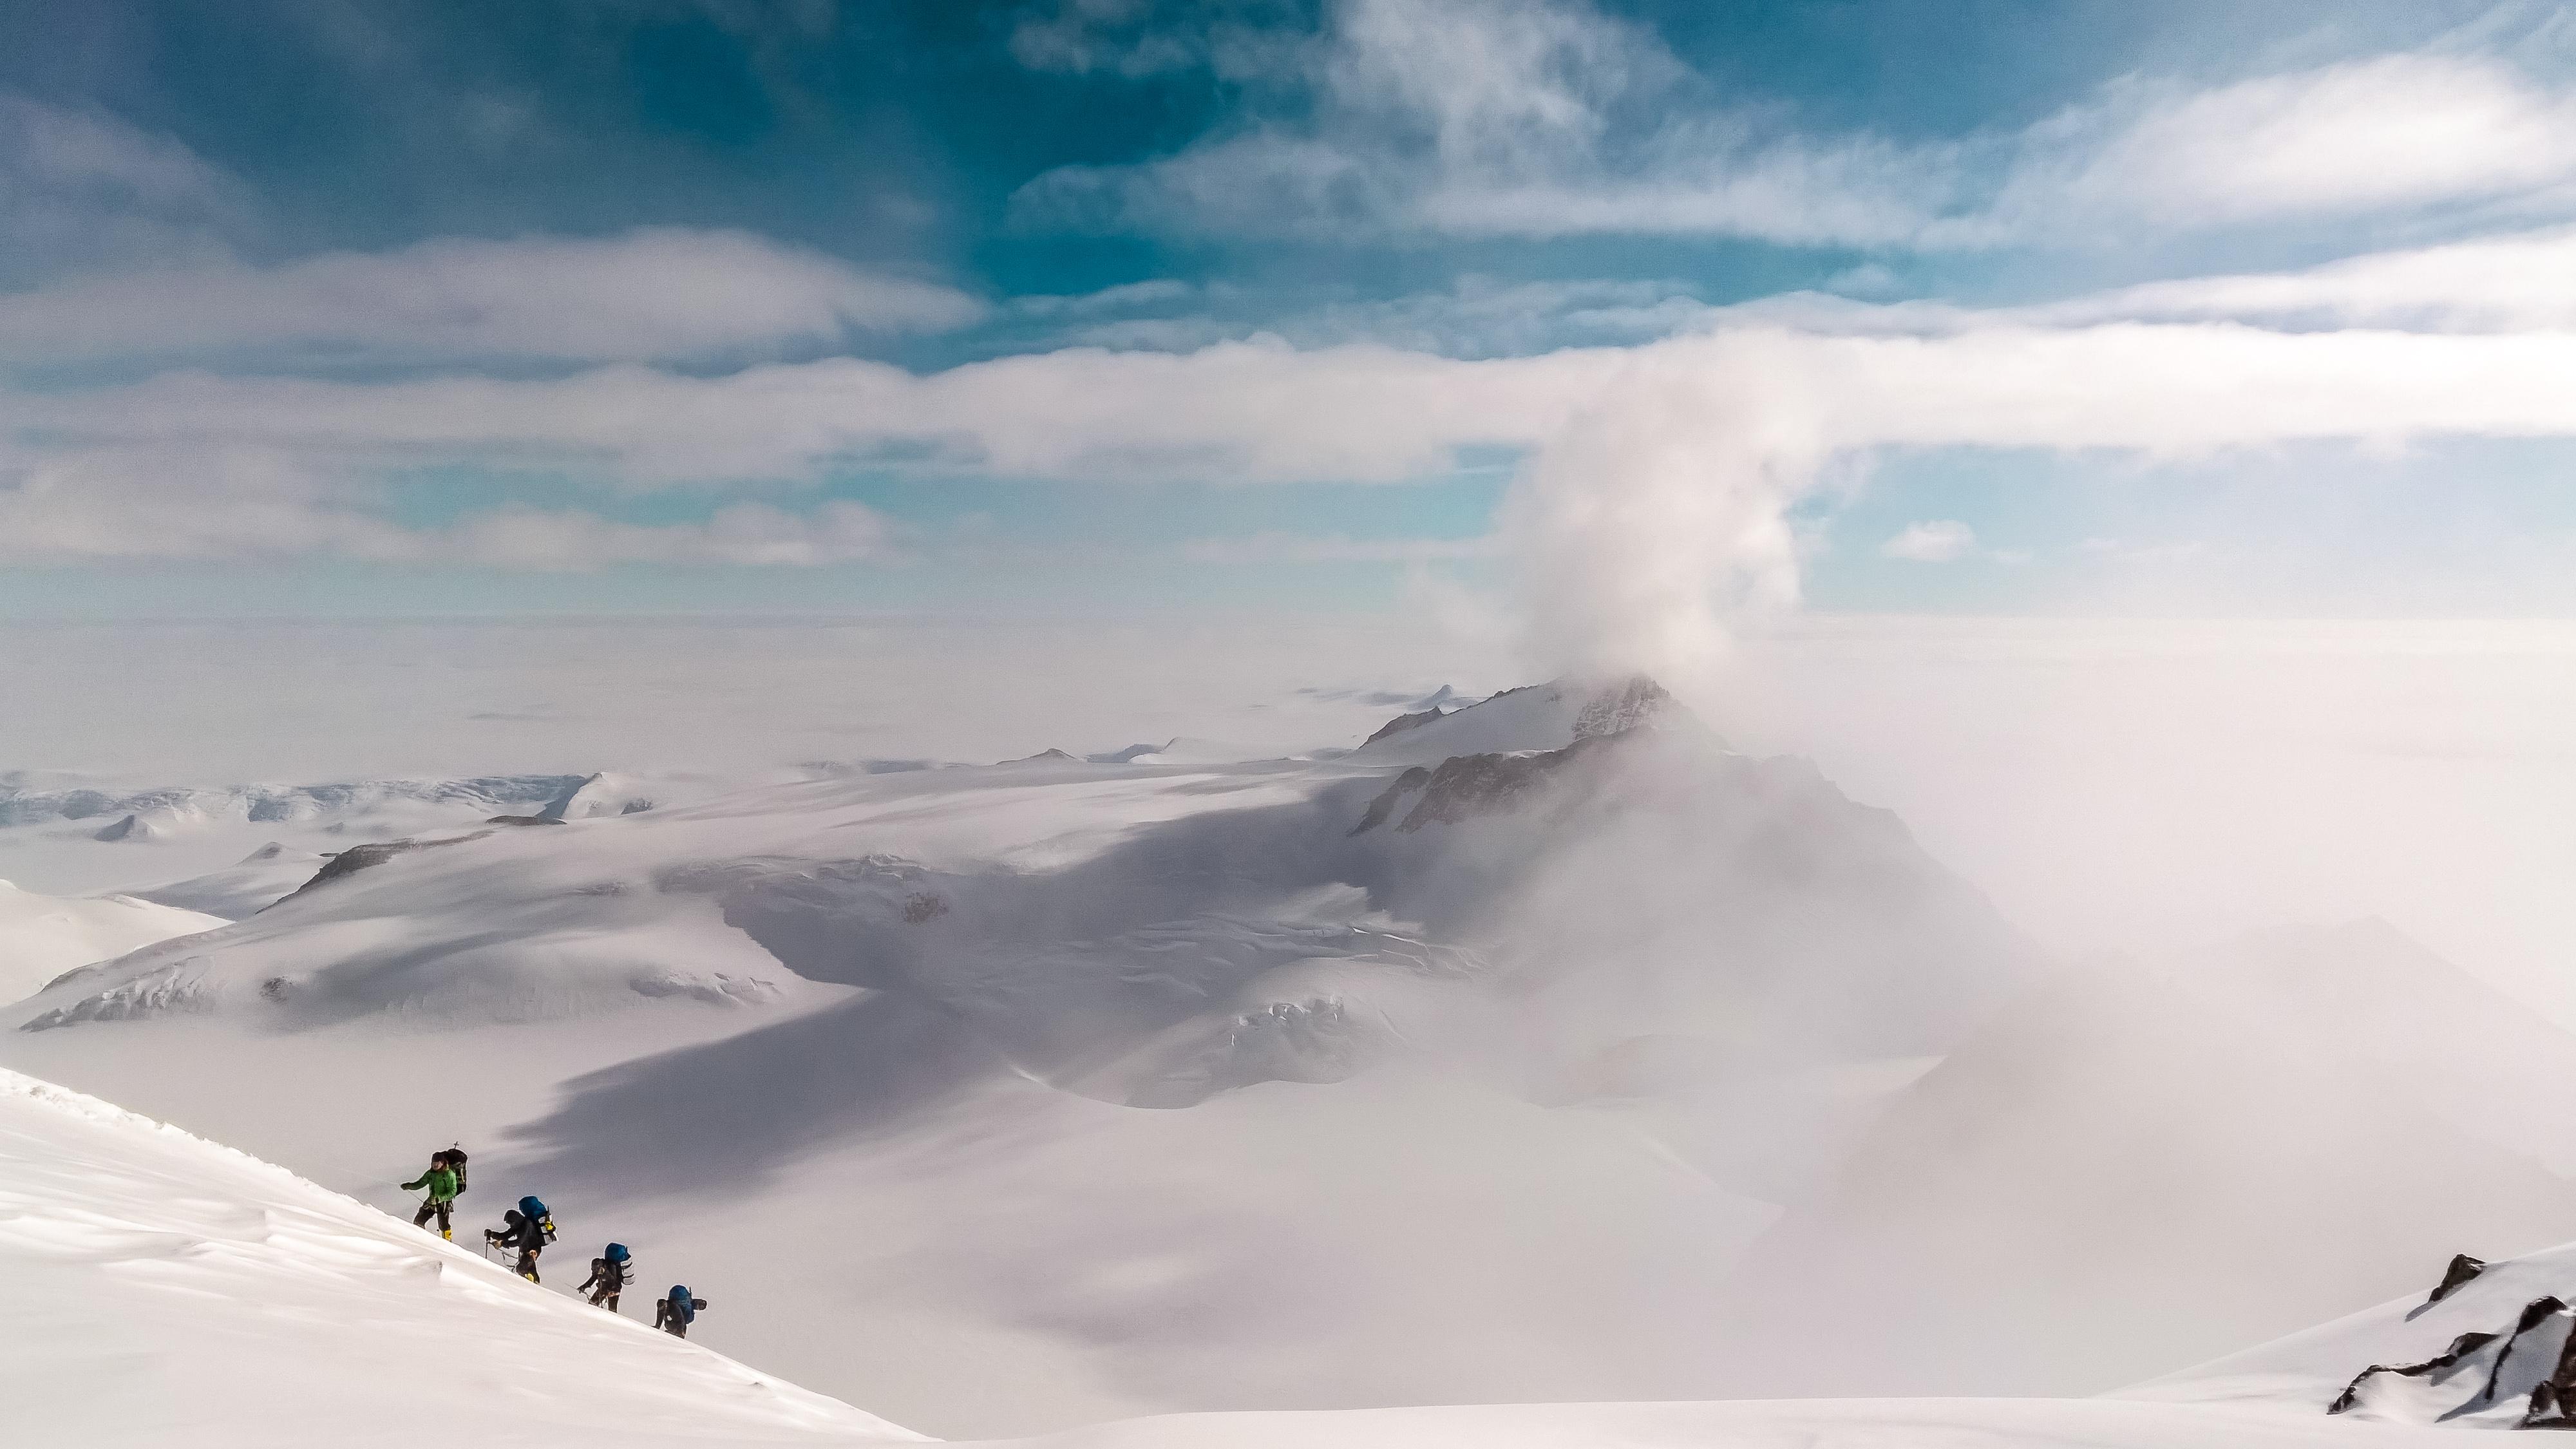 Martin Szwed, Tespack, Antarctica--52